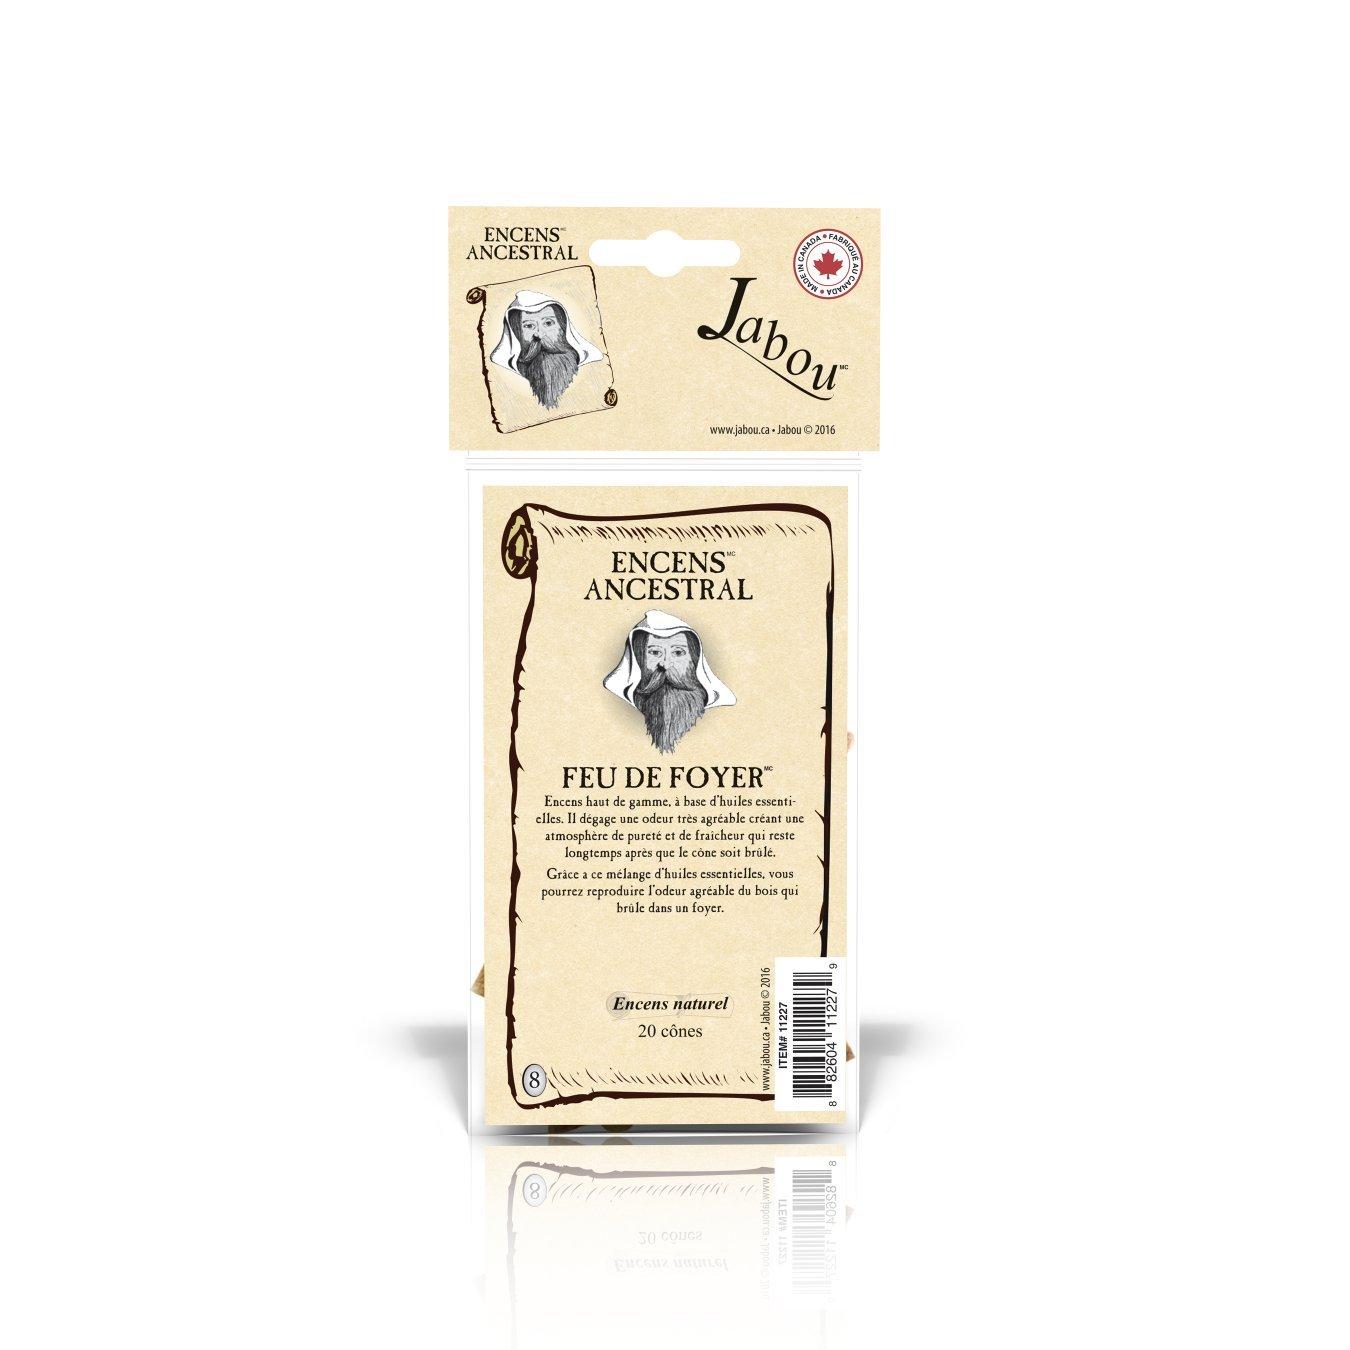 Jabou Ancestral スーパーSALE セール期間限定 100%天然お香 コーン - 日本全国 送料無料 12個のアロマ 瞑想 ヨガ リラクゼーション Place ヒーリング 儀式 B07D25SRCN 20個のコーン マジック 各30分以上持続 祈り Fire